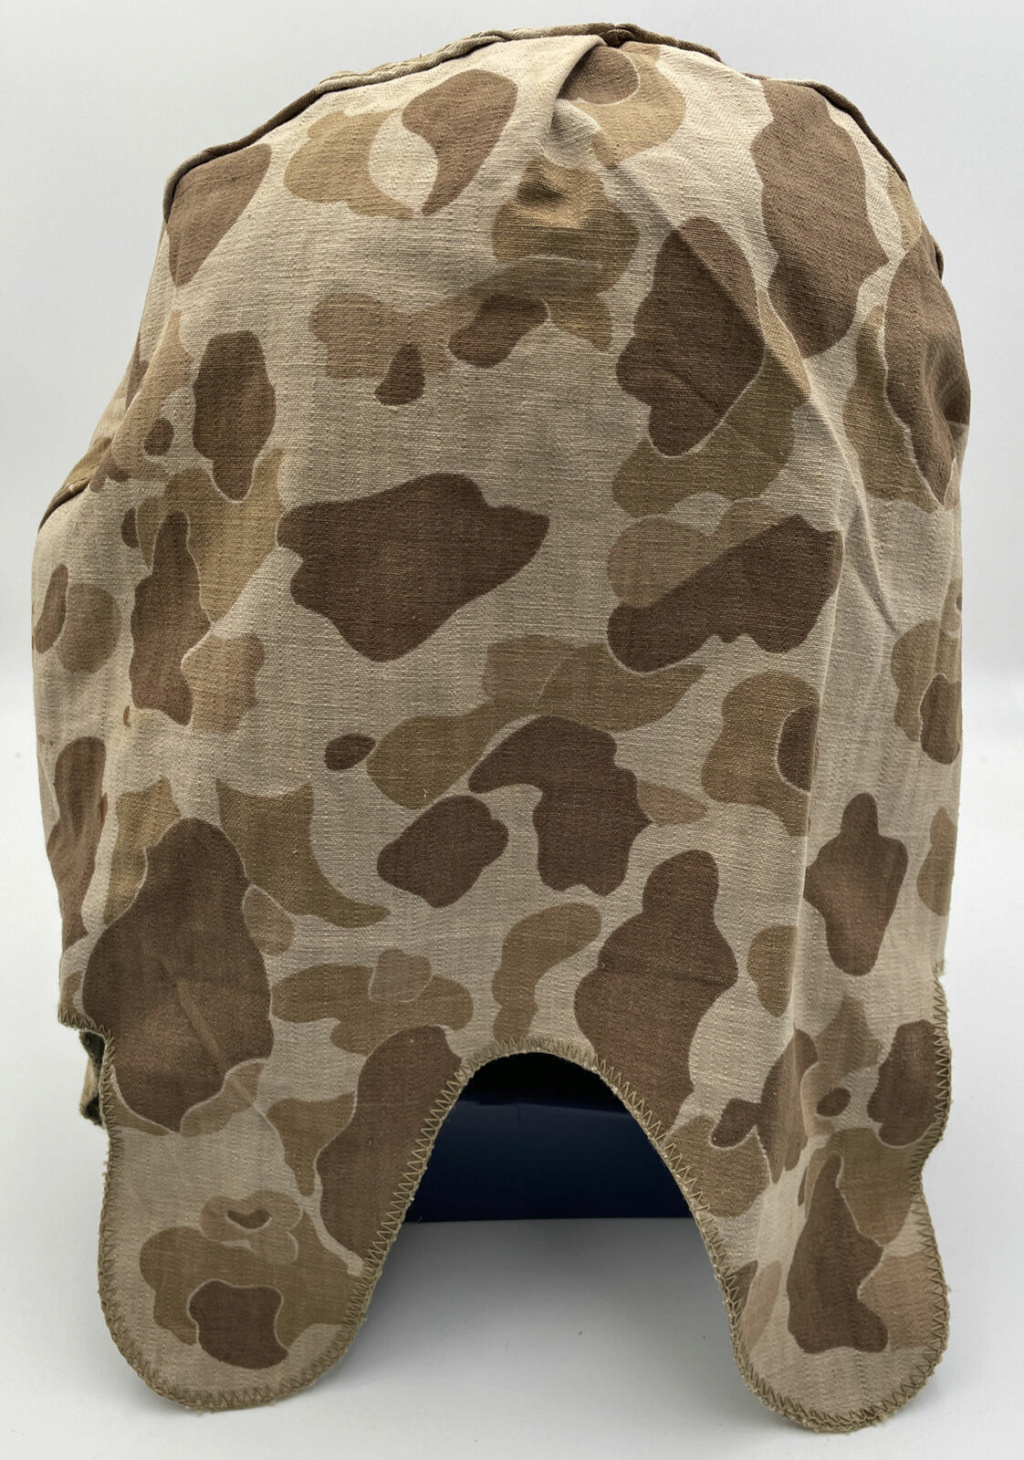 Couvre-casque USMC 932